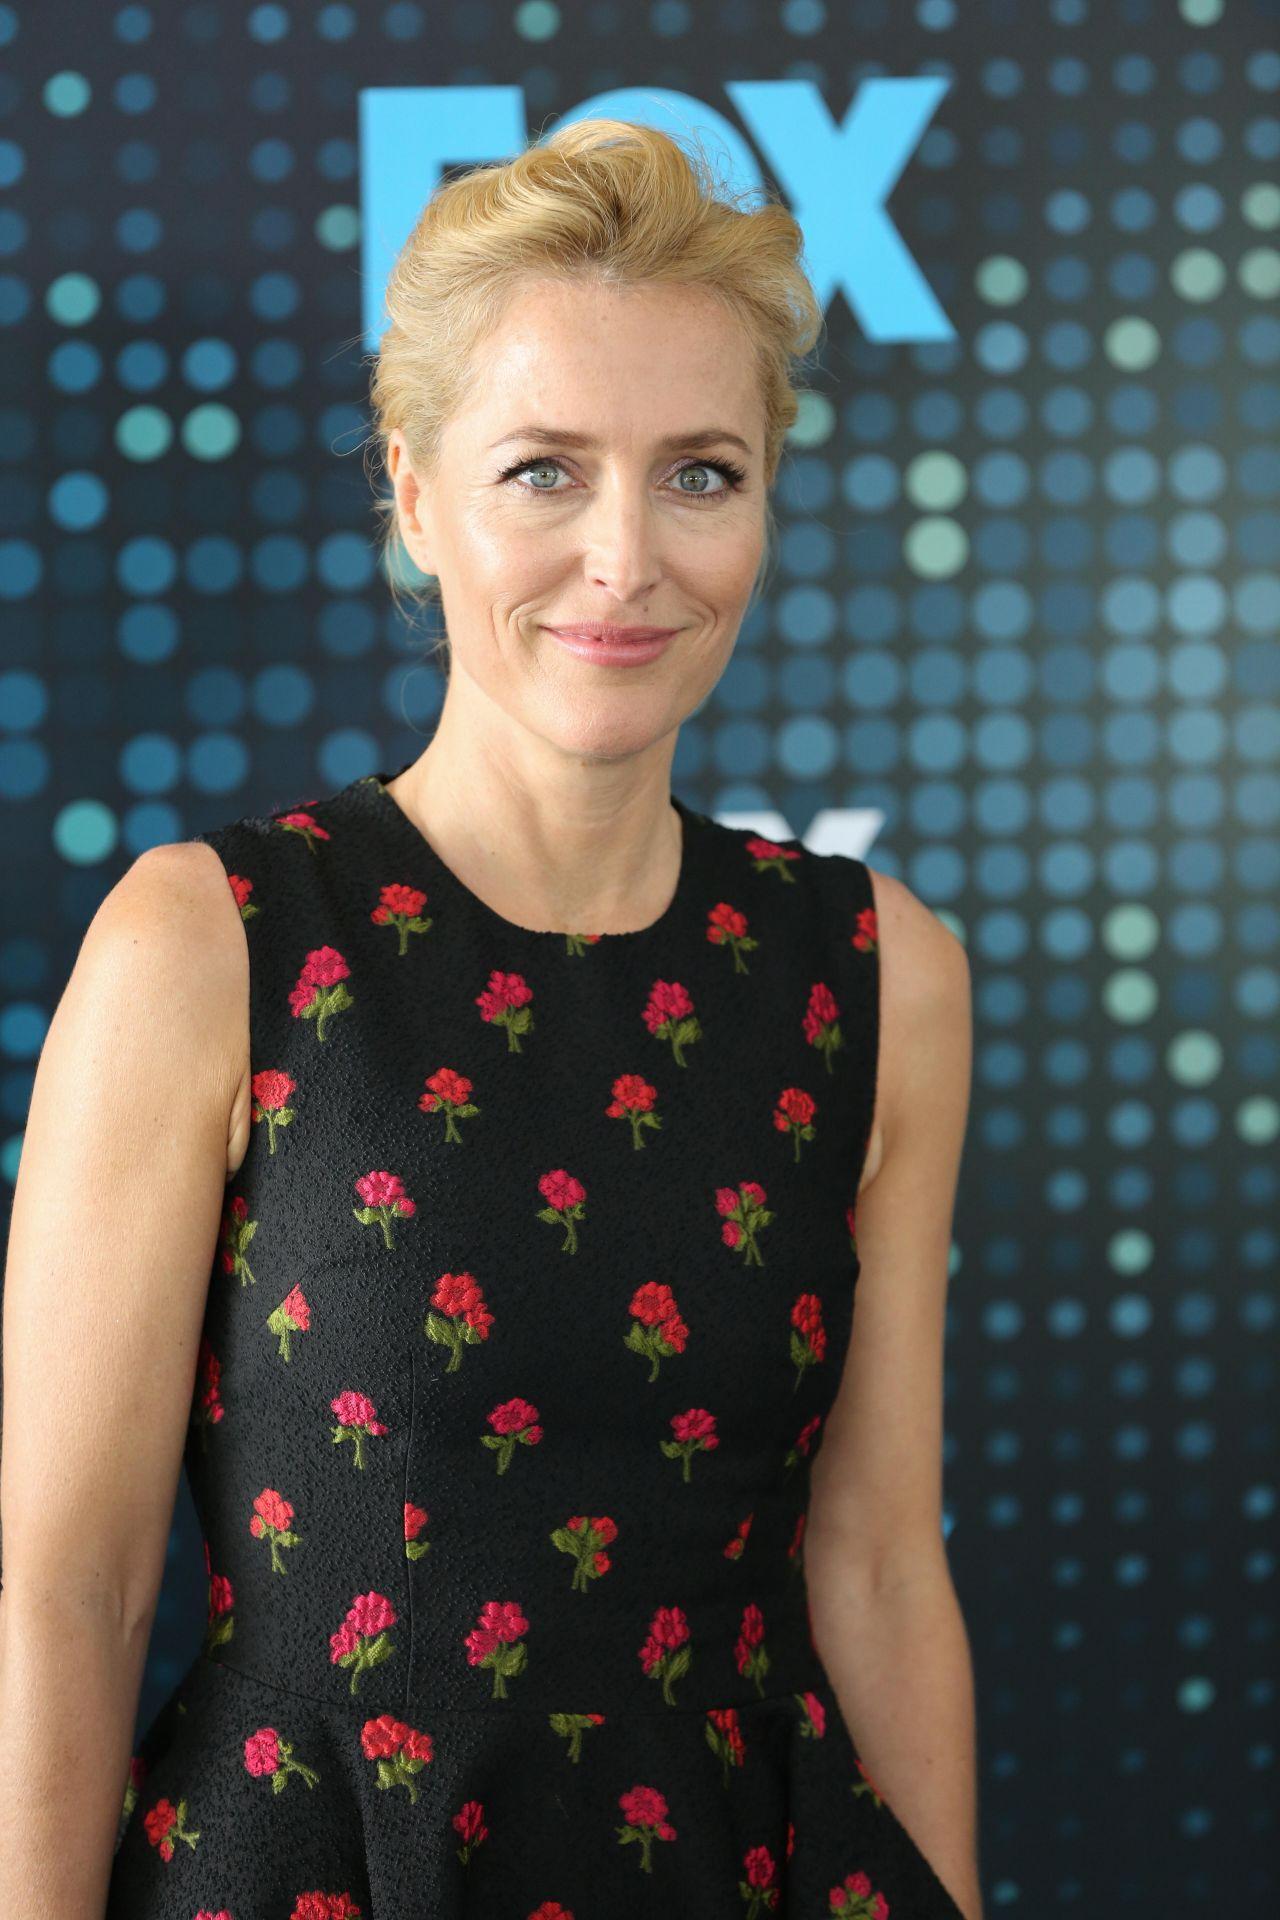 Gillian Anderson Fox Upfront Presentation In Nyc 05 15 2017